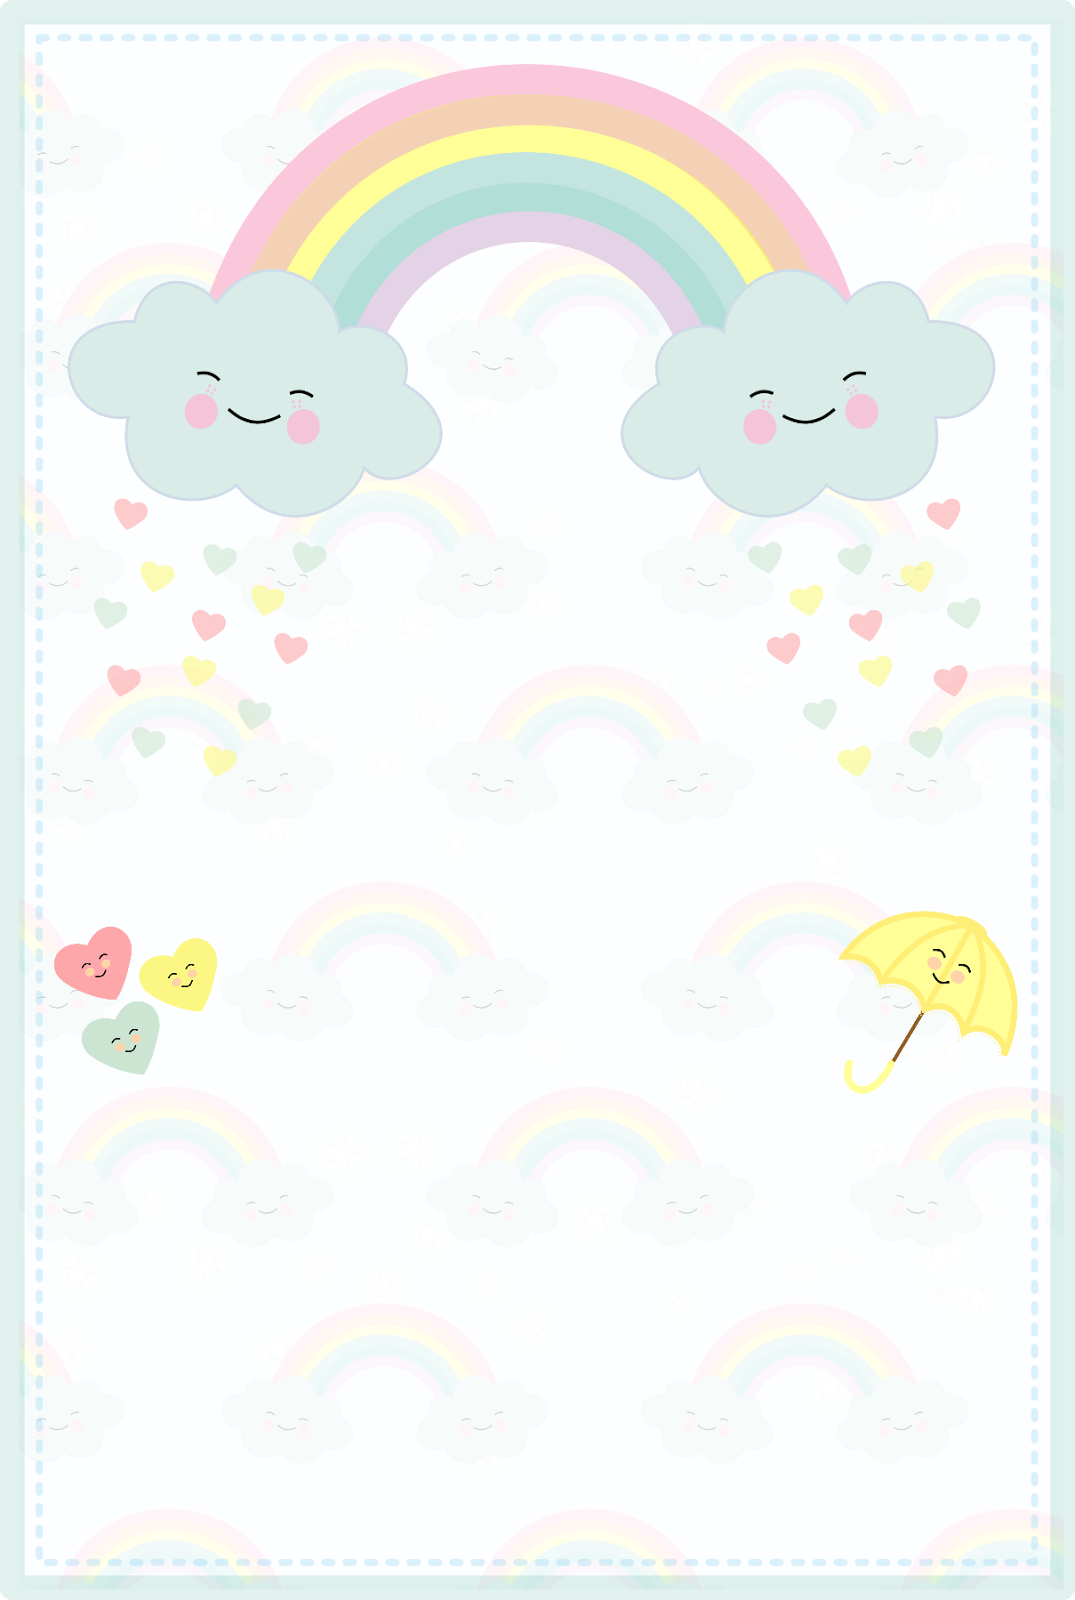 Tema Matrimonio De Amor : Convites tema chuva de amor para menina grátis baixar